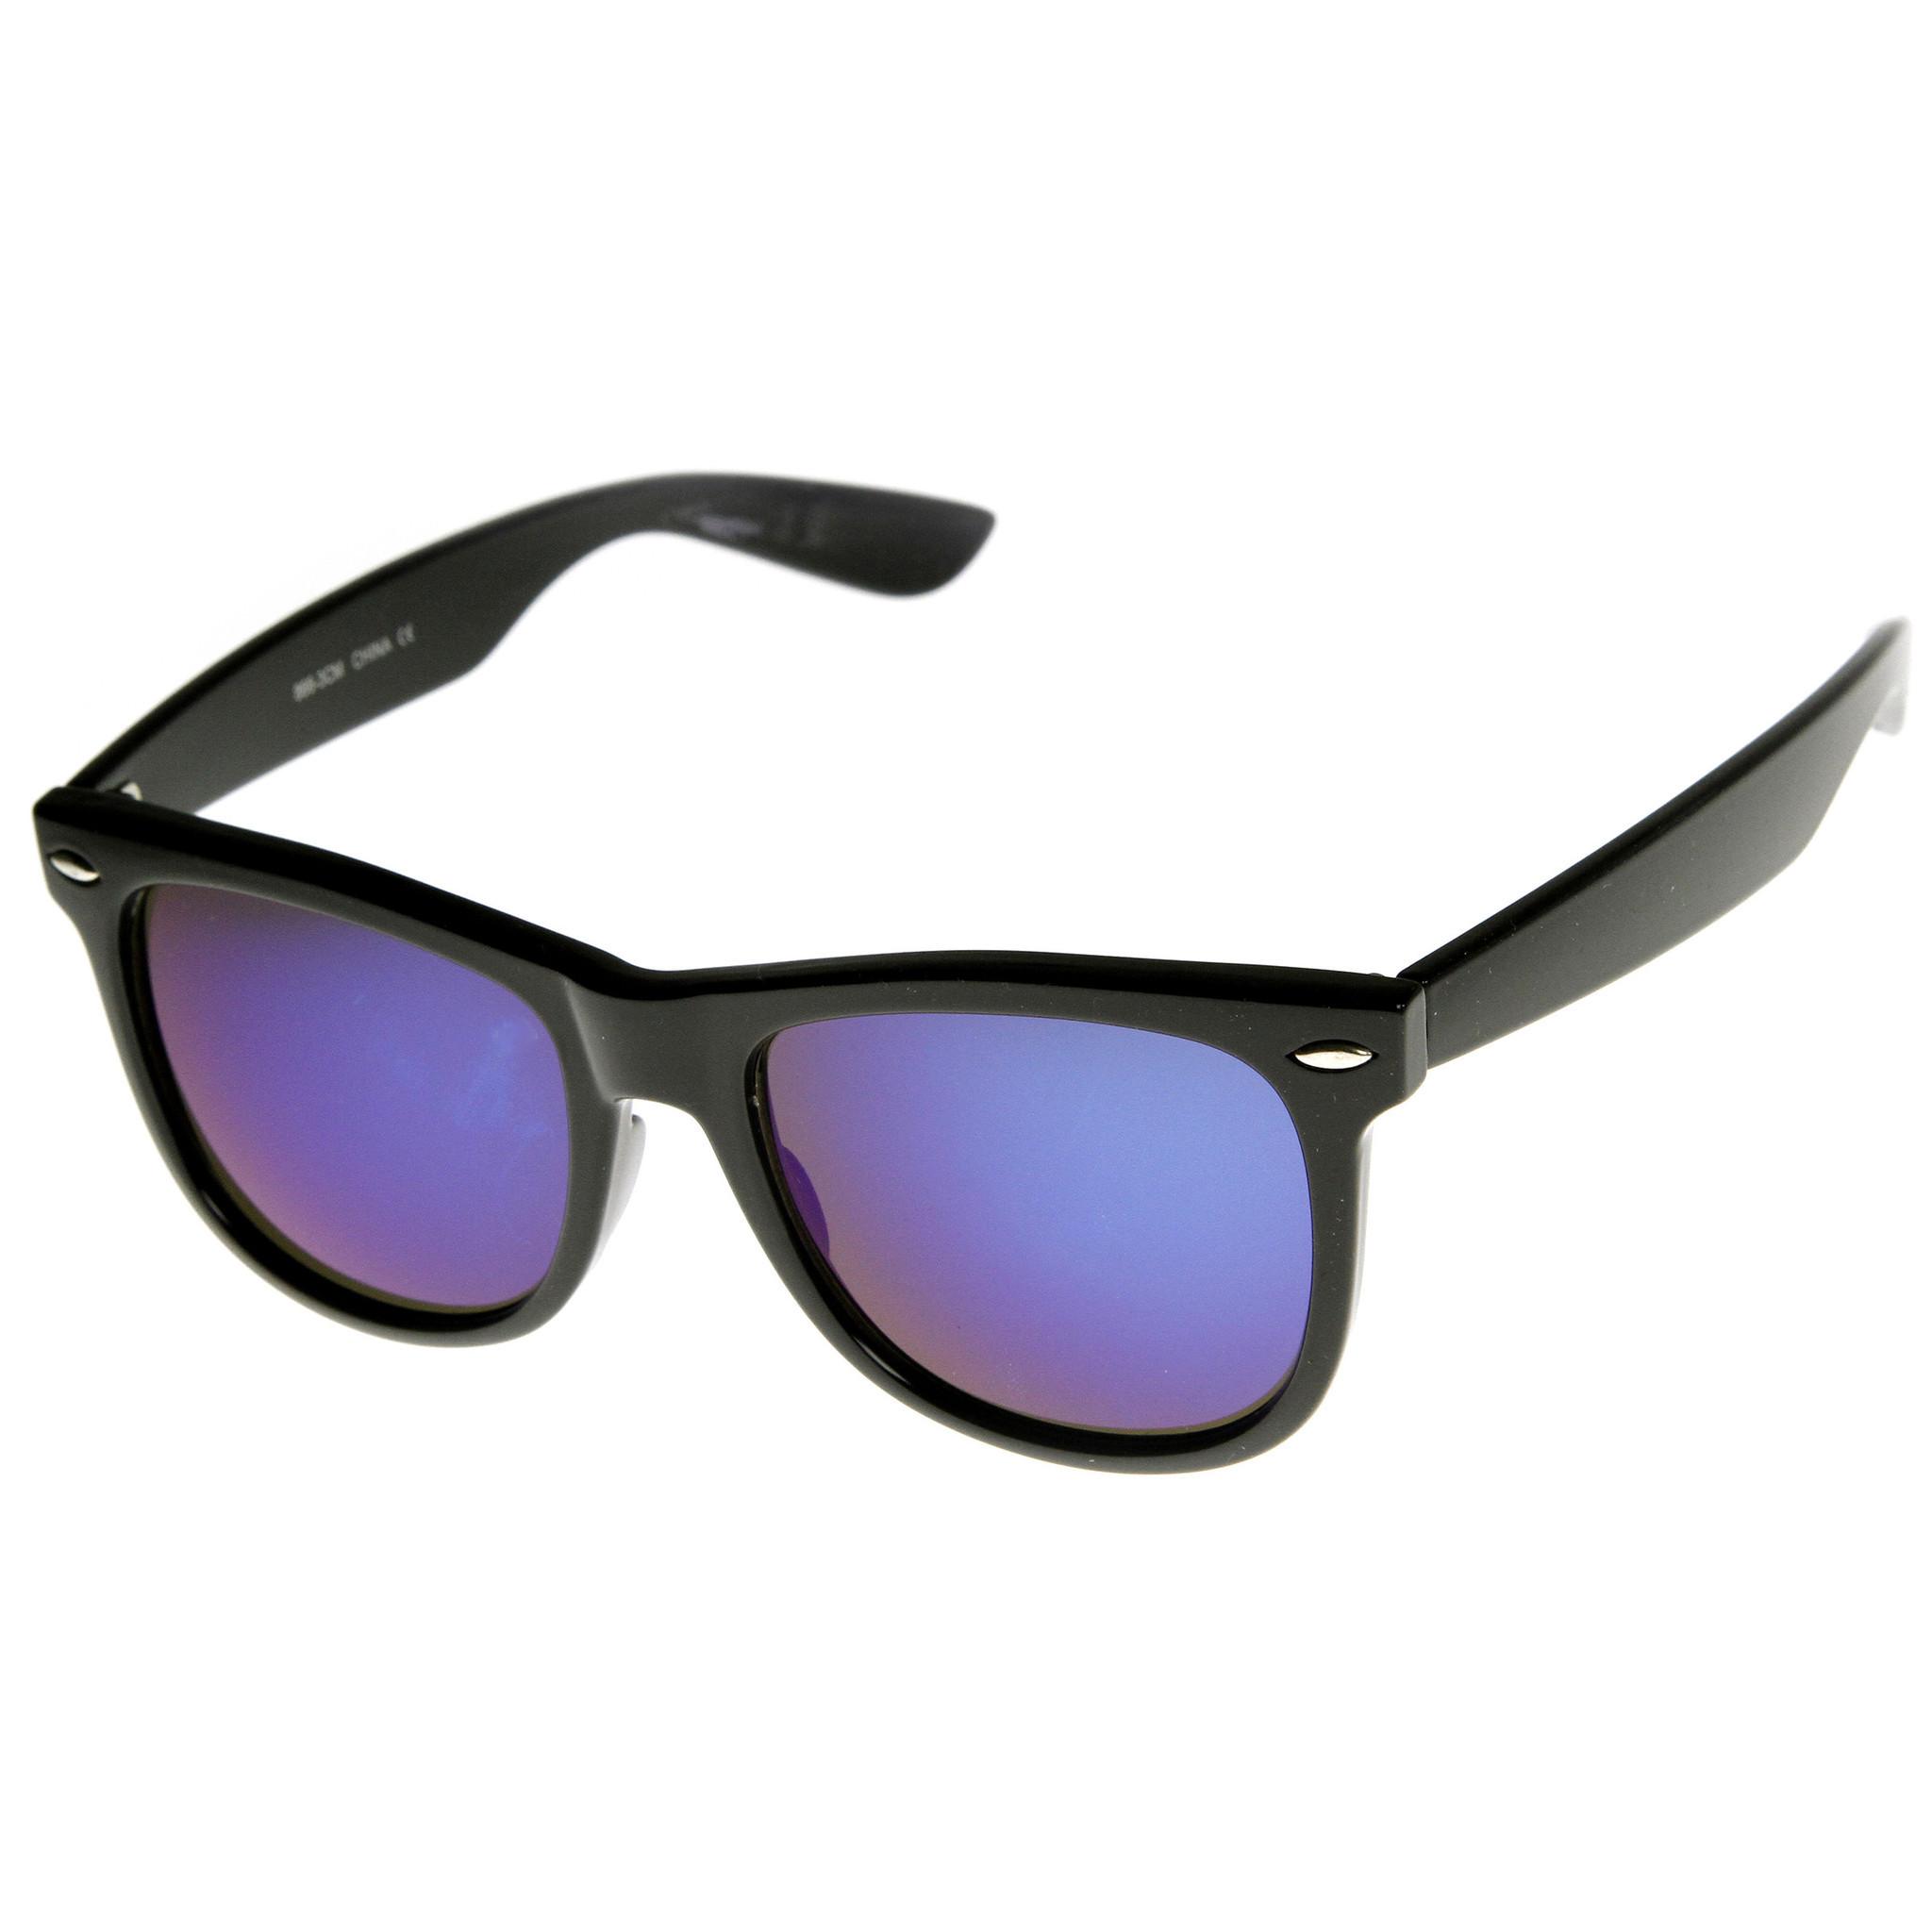 Hipster Trendy Colorful Flash Revo Lens Wayfarer Sunglasses 8078